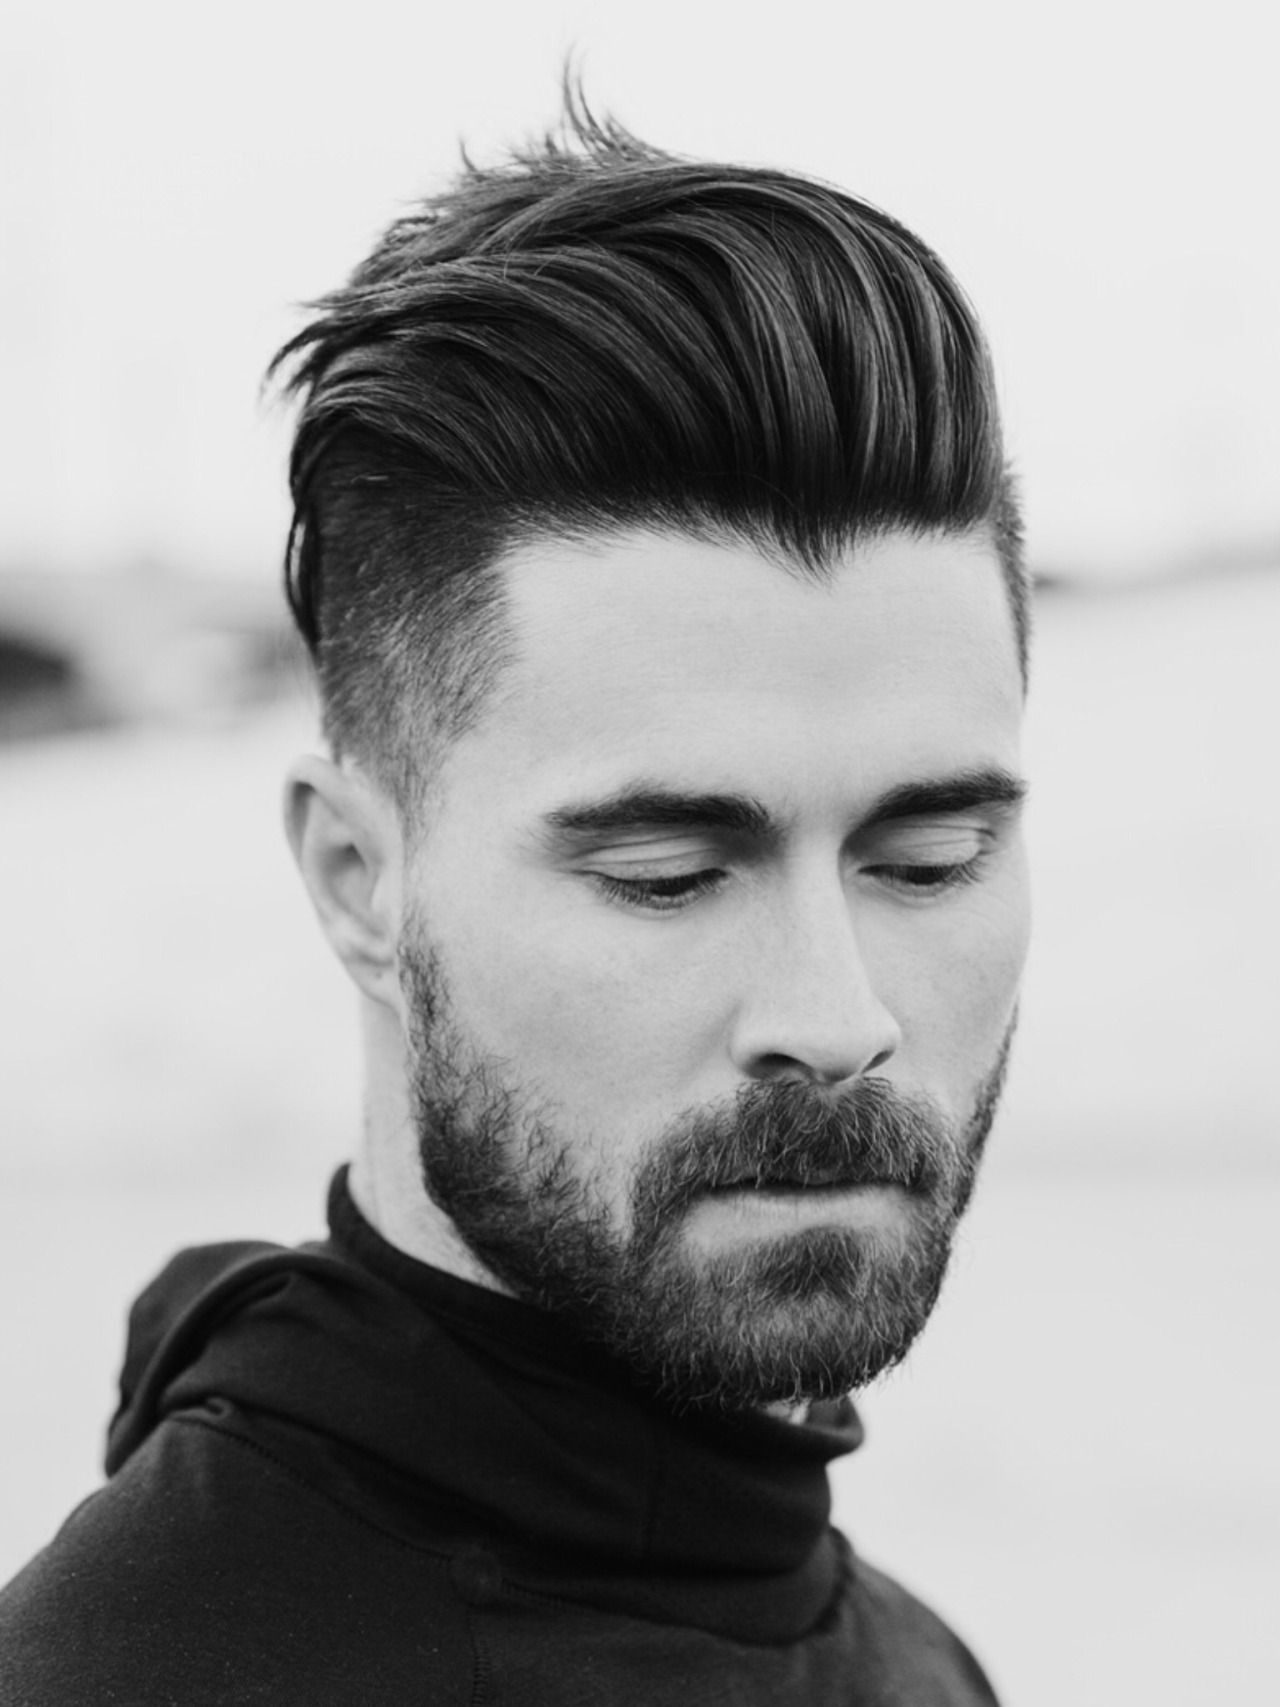 Menus hairstyles menus hair style pinterest mystery haircuts